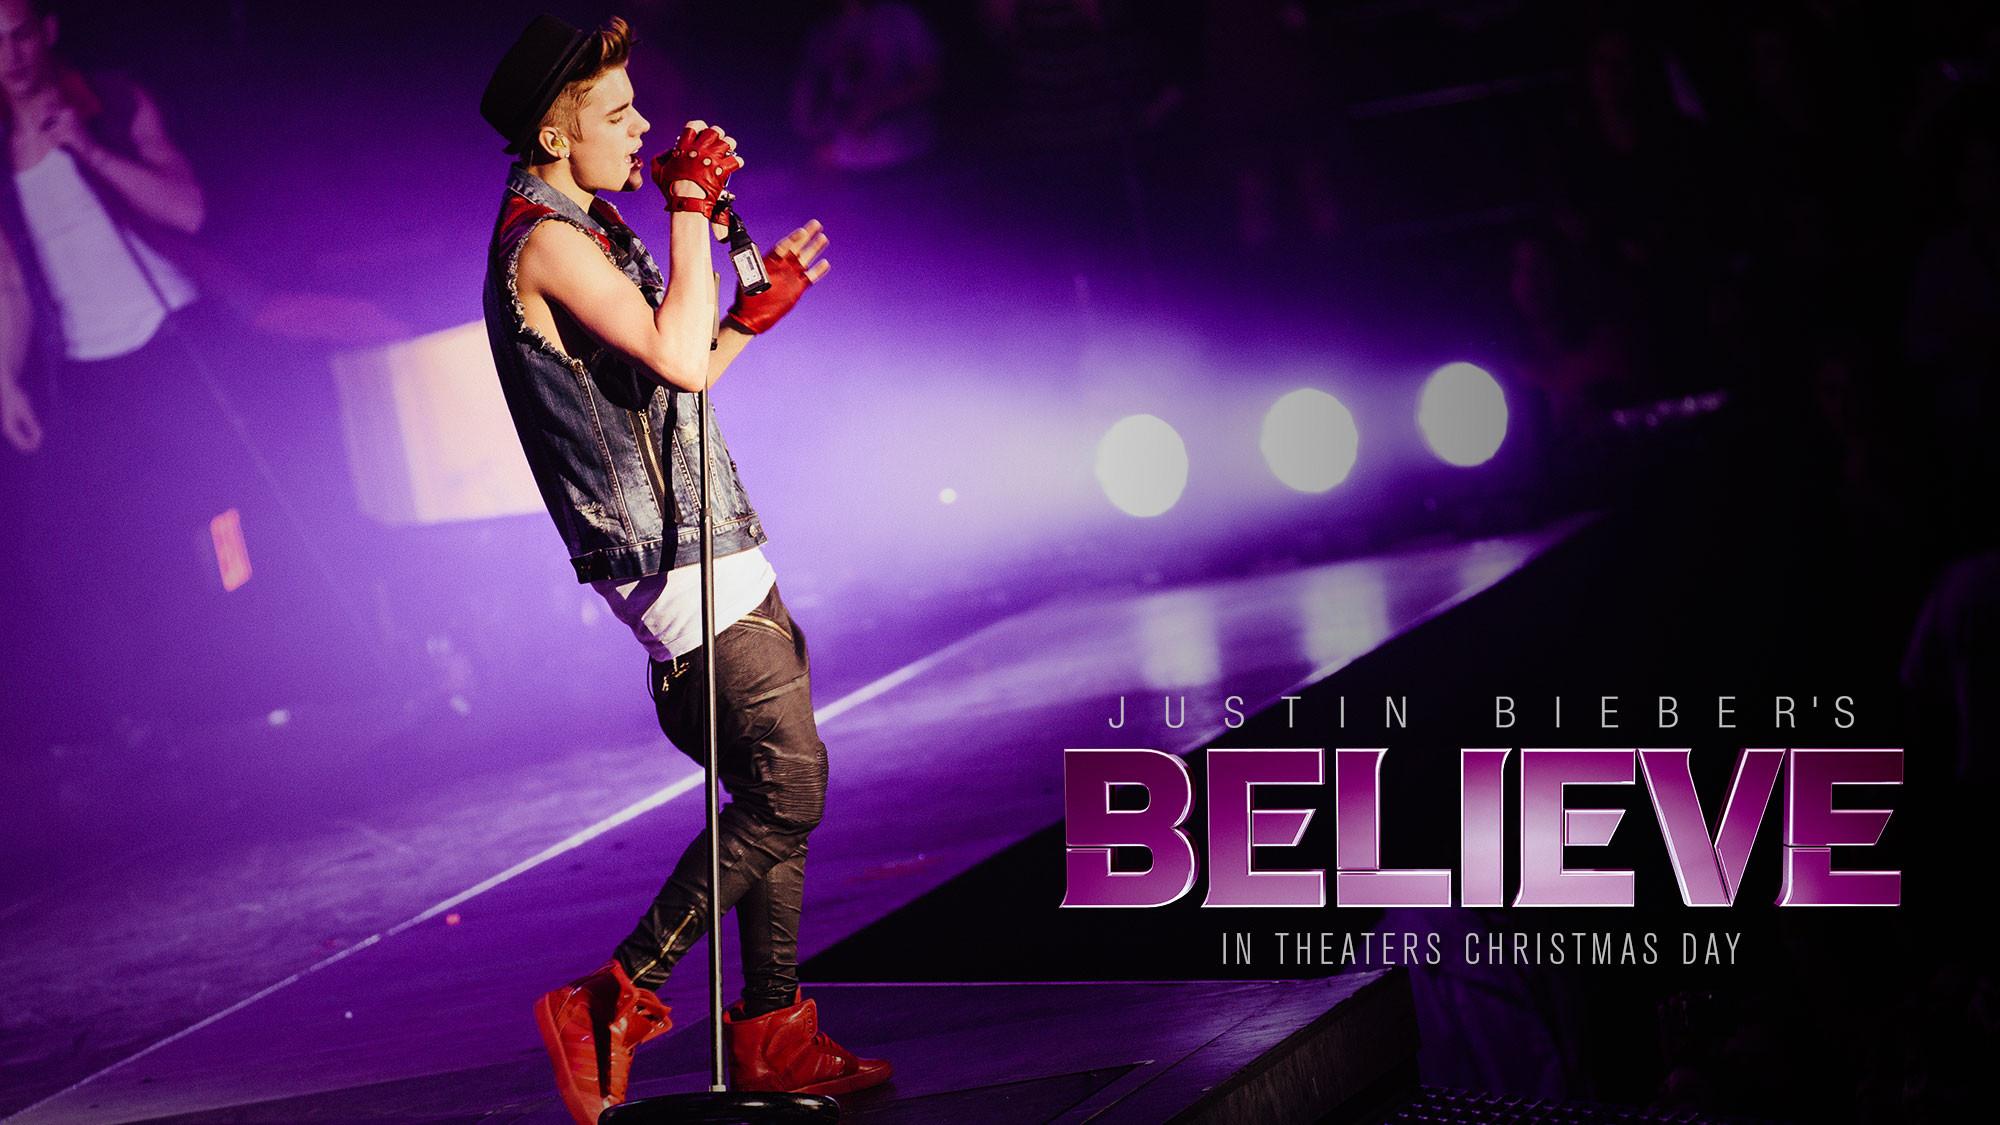 Justin Bieber's Believe wallpaper 2.jpg